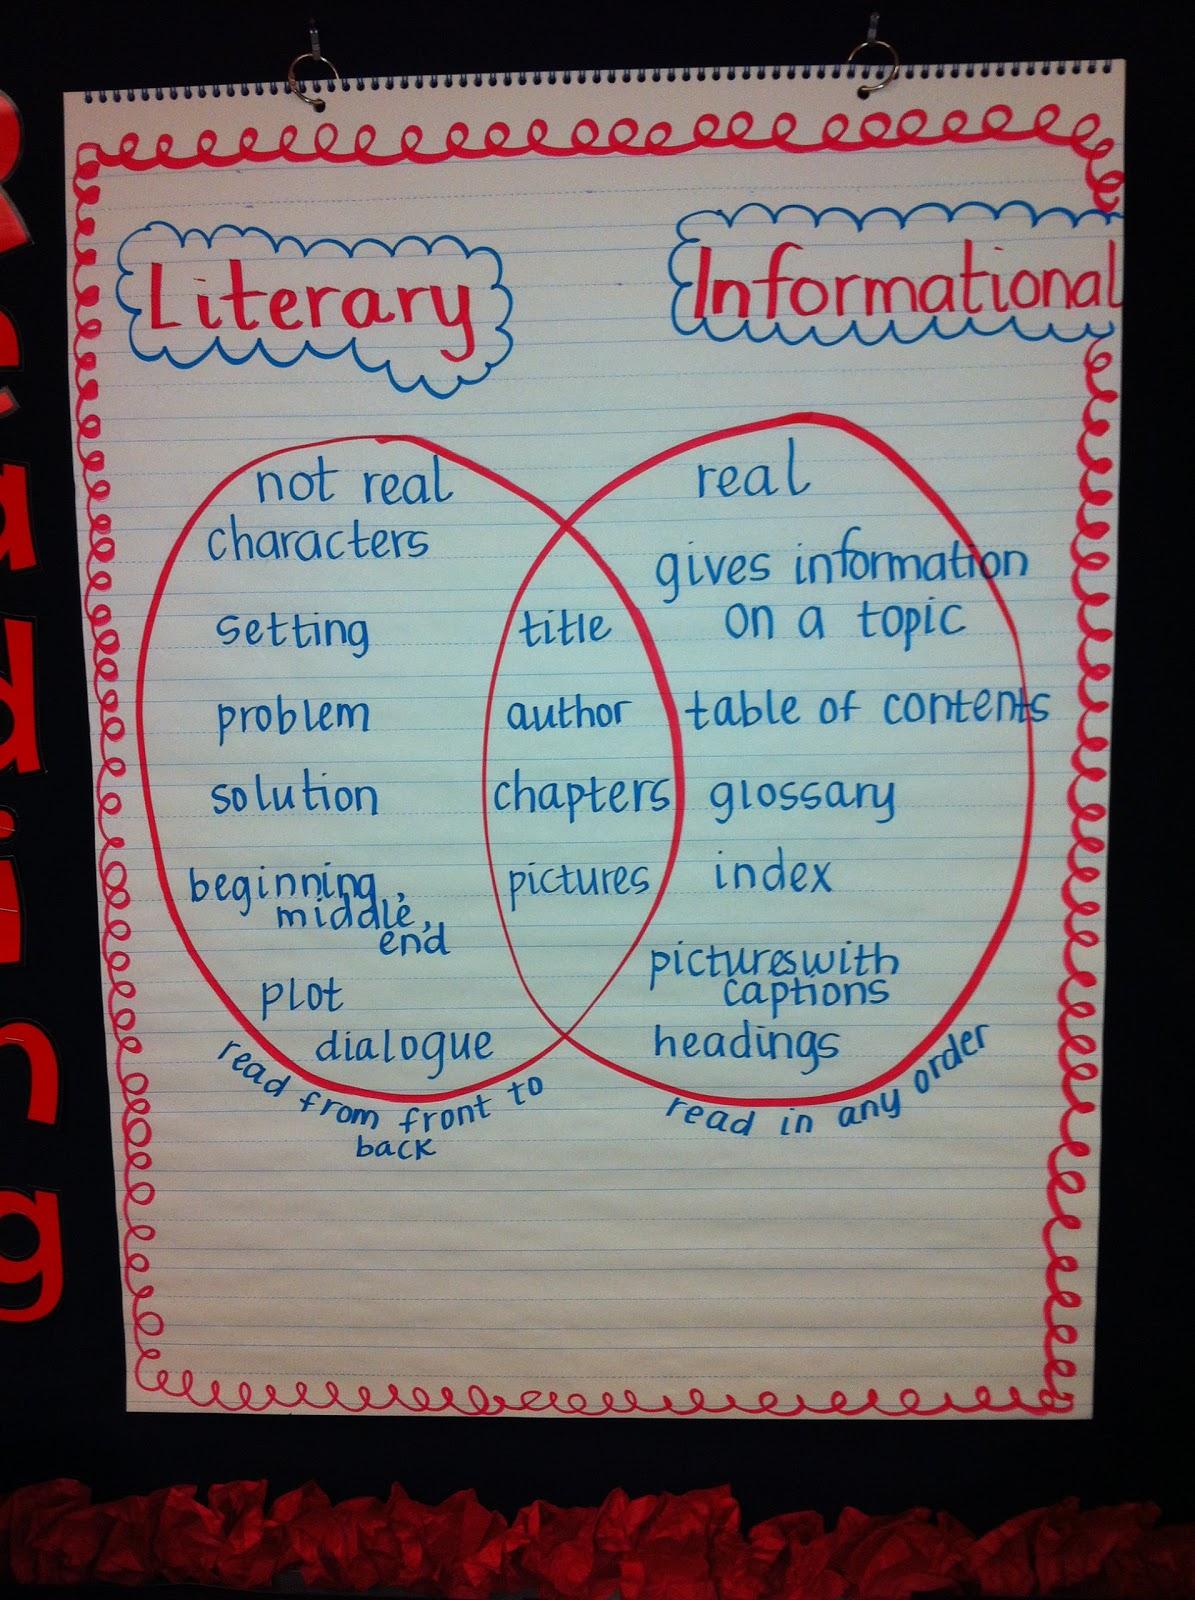 Fiction Vs Nonfiction Venn Diagram Rb20det Ecu Wiring Teach Dream Inspire Going Batty